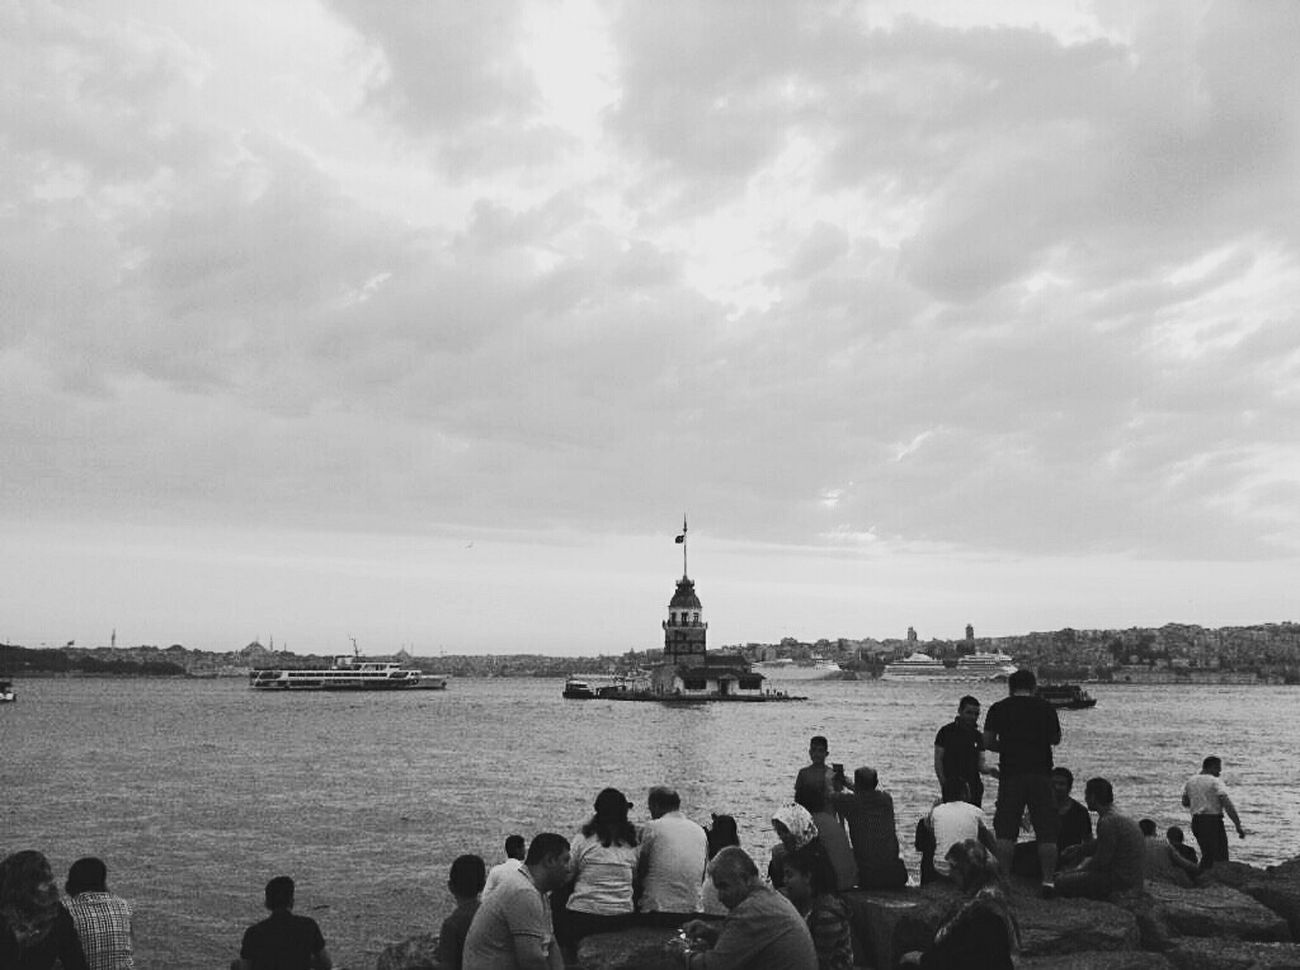 Vscogood Afterlight Bluesky Sea Vscoturkey Vscodaily Vscogrid Turkishfollowers Istanbul Turkey Vscogallery